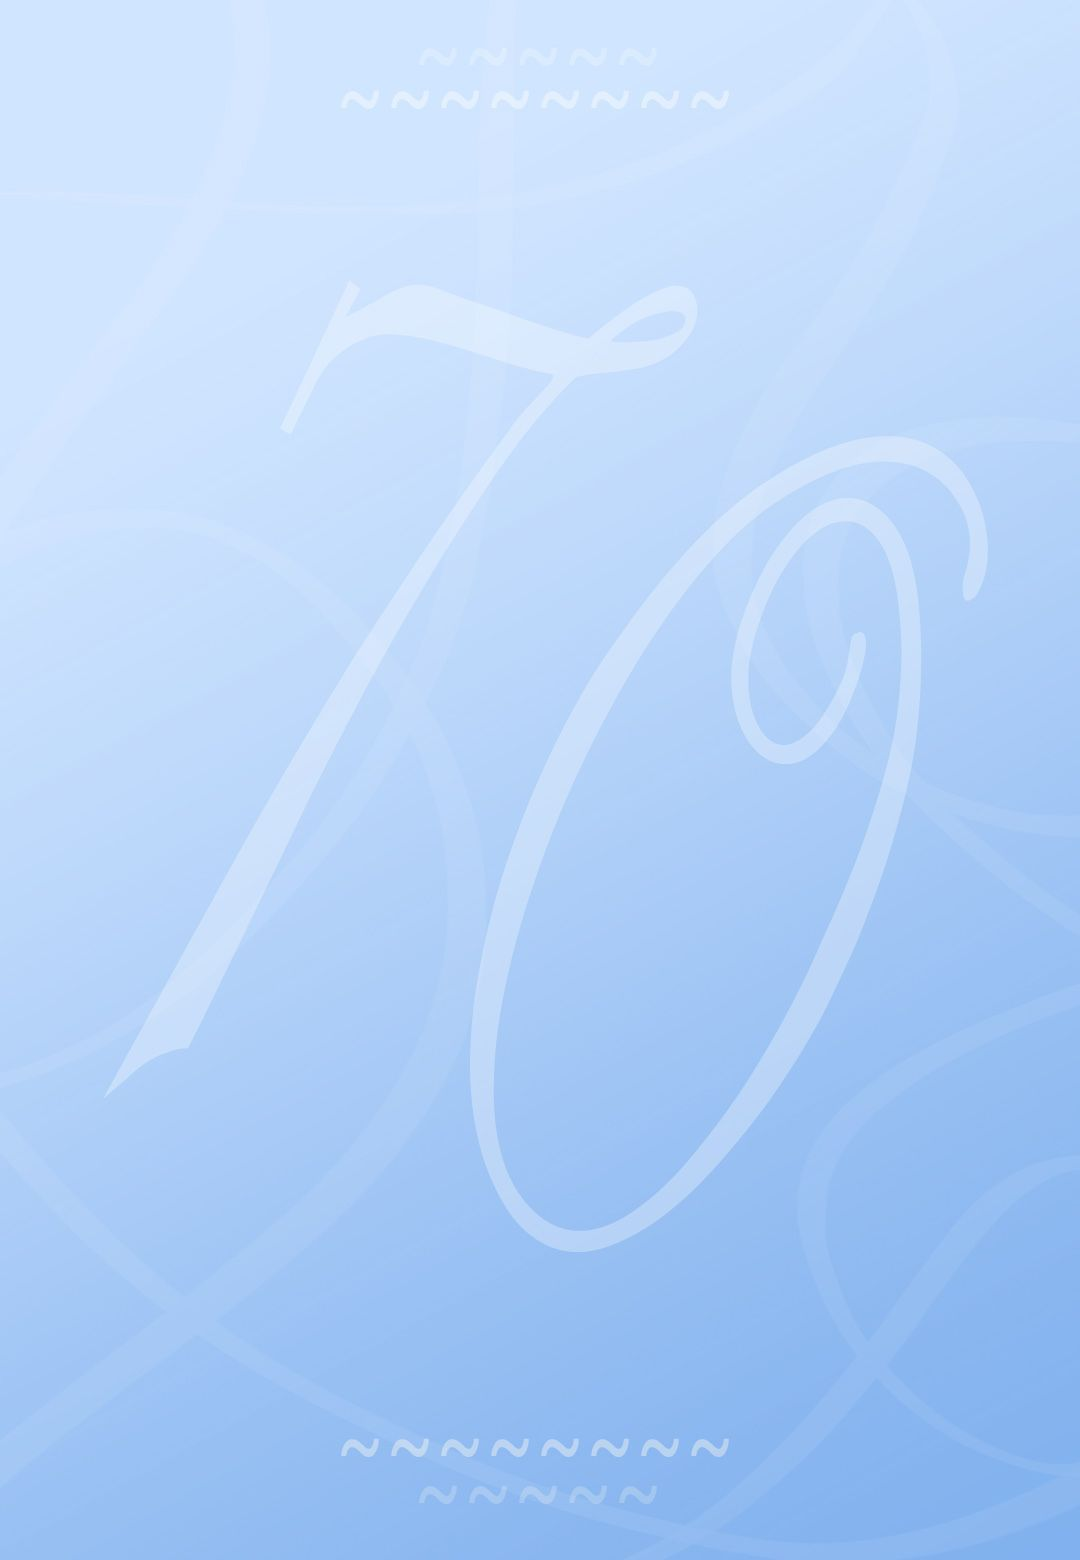 004 Surprising 70th Birthday Invitation Template Free Example  Surprise Invite With PhotoFull